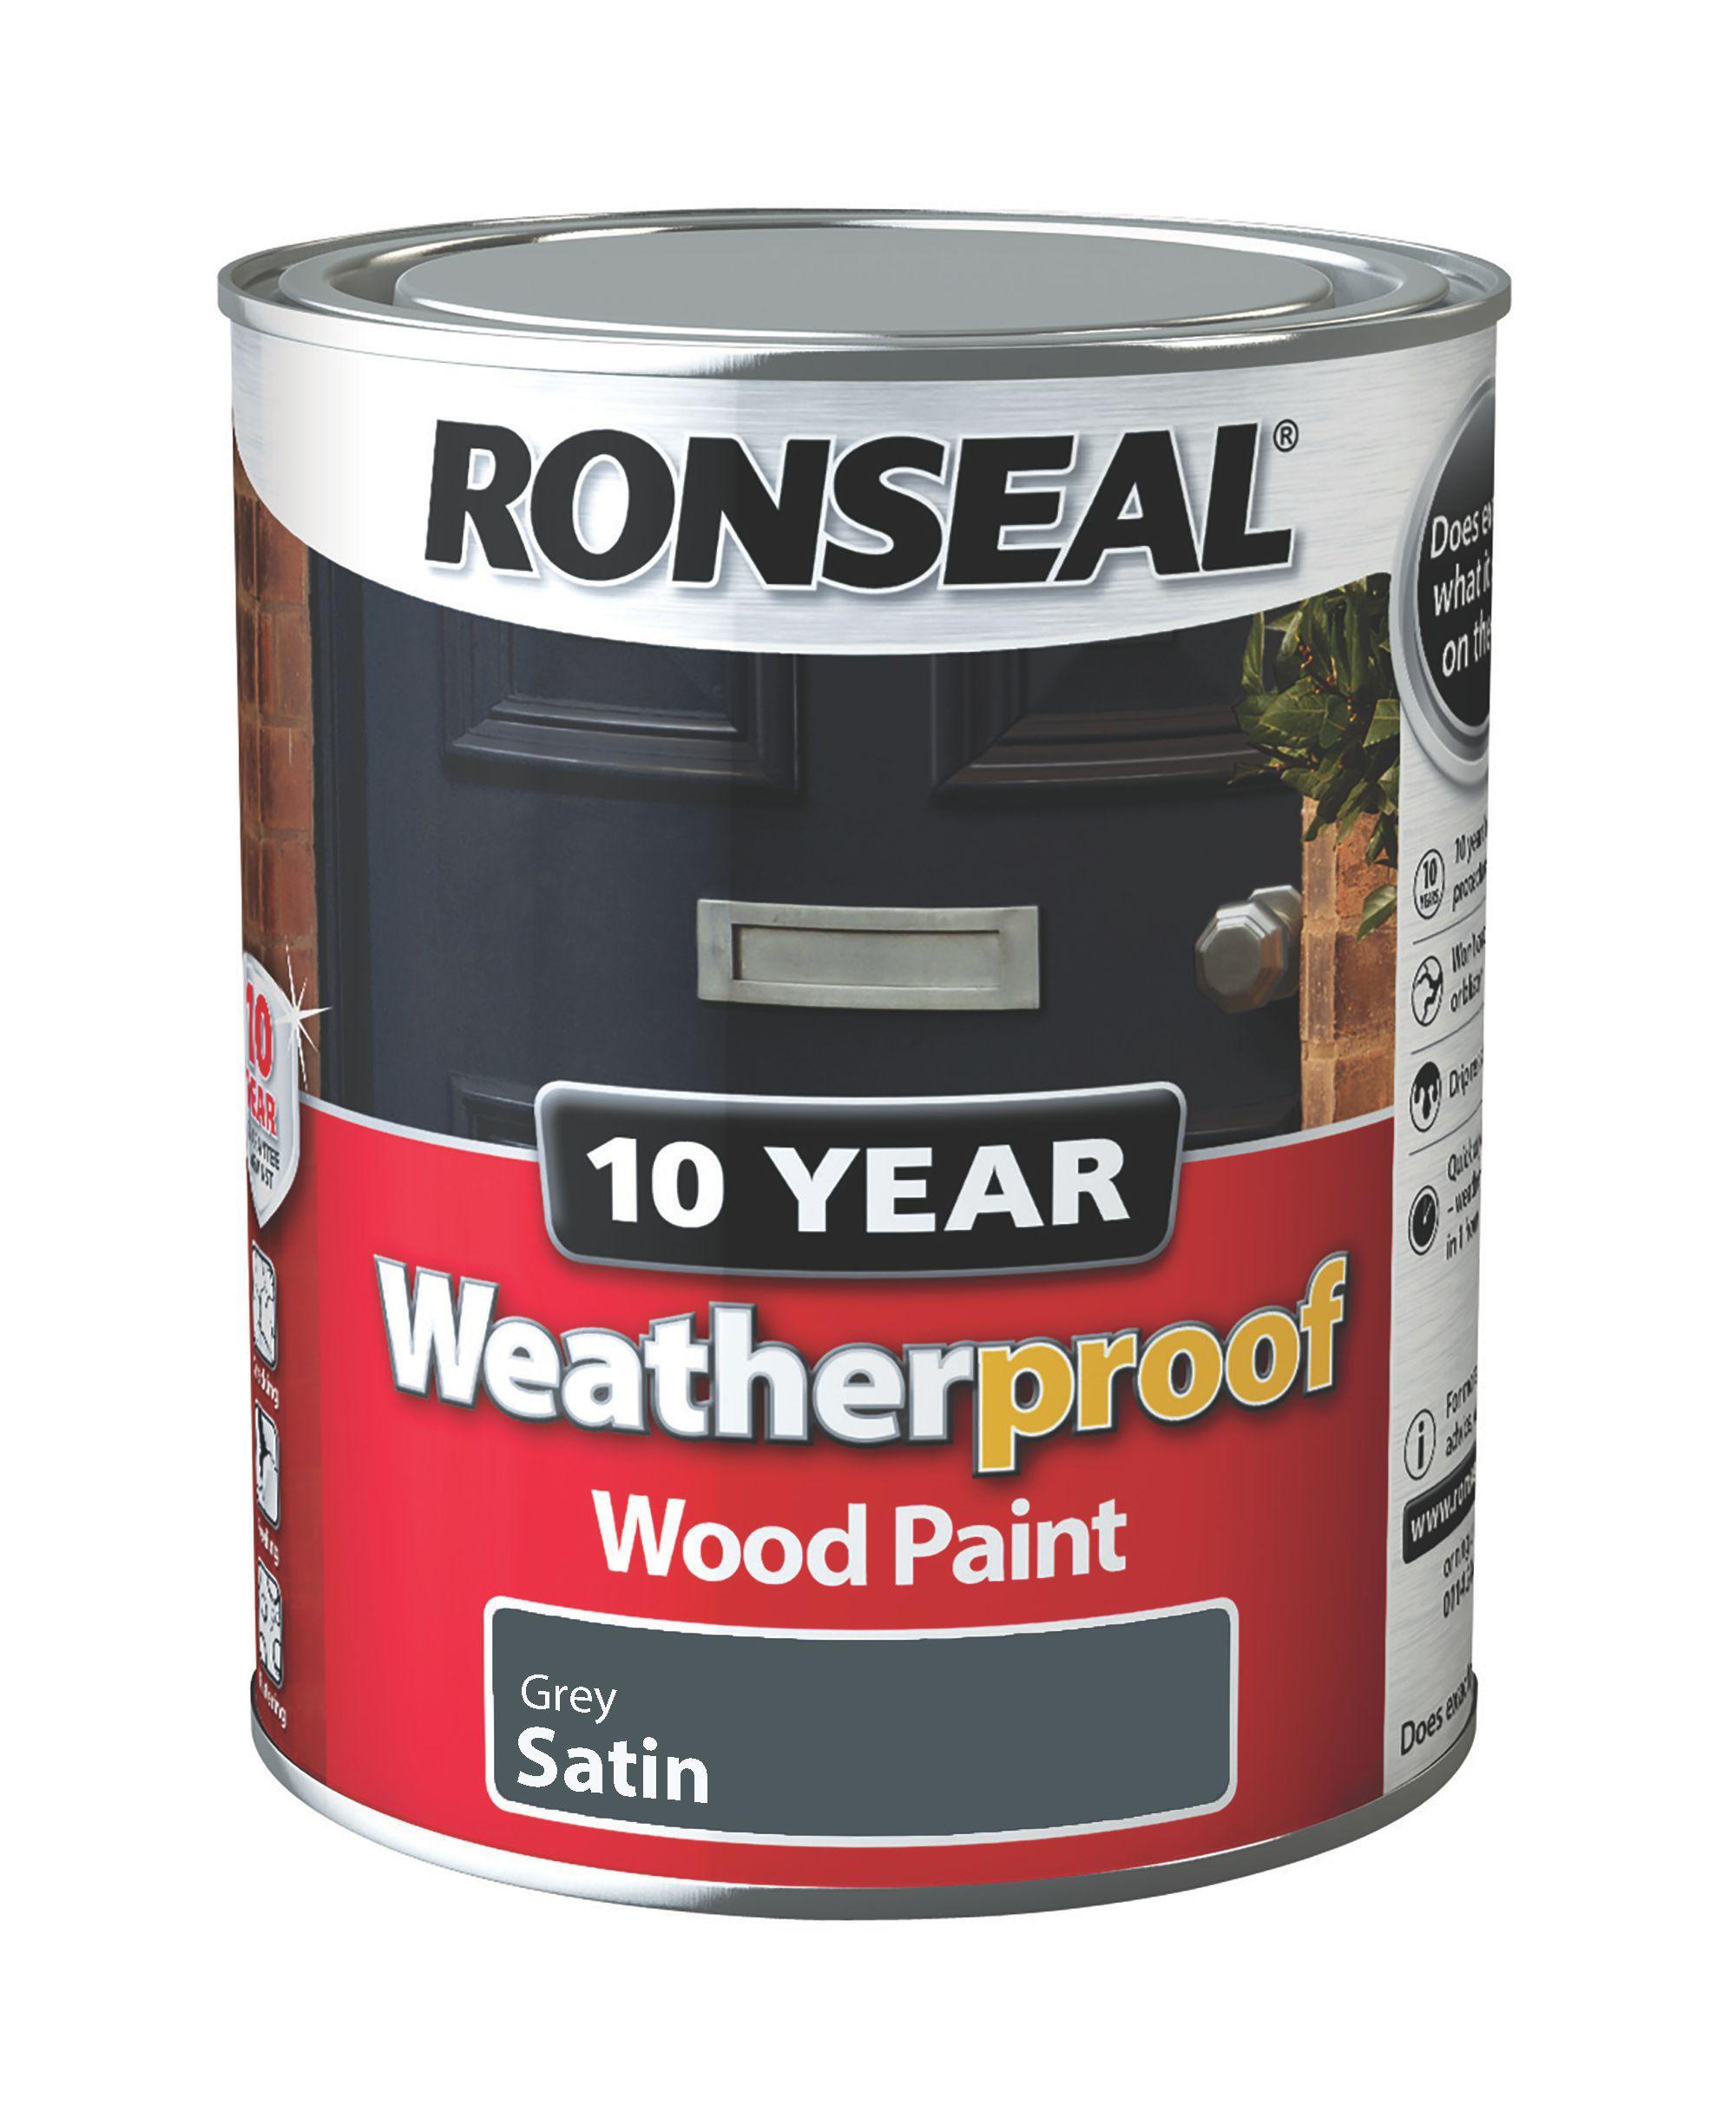 Ronseal Grey Stone Satin Wood Paint 750ml Departments Diy At B Q